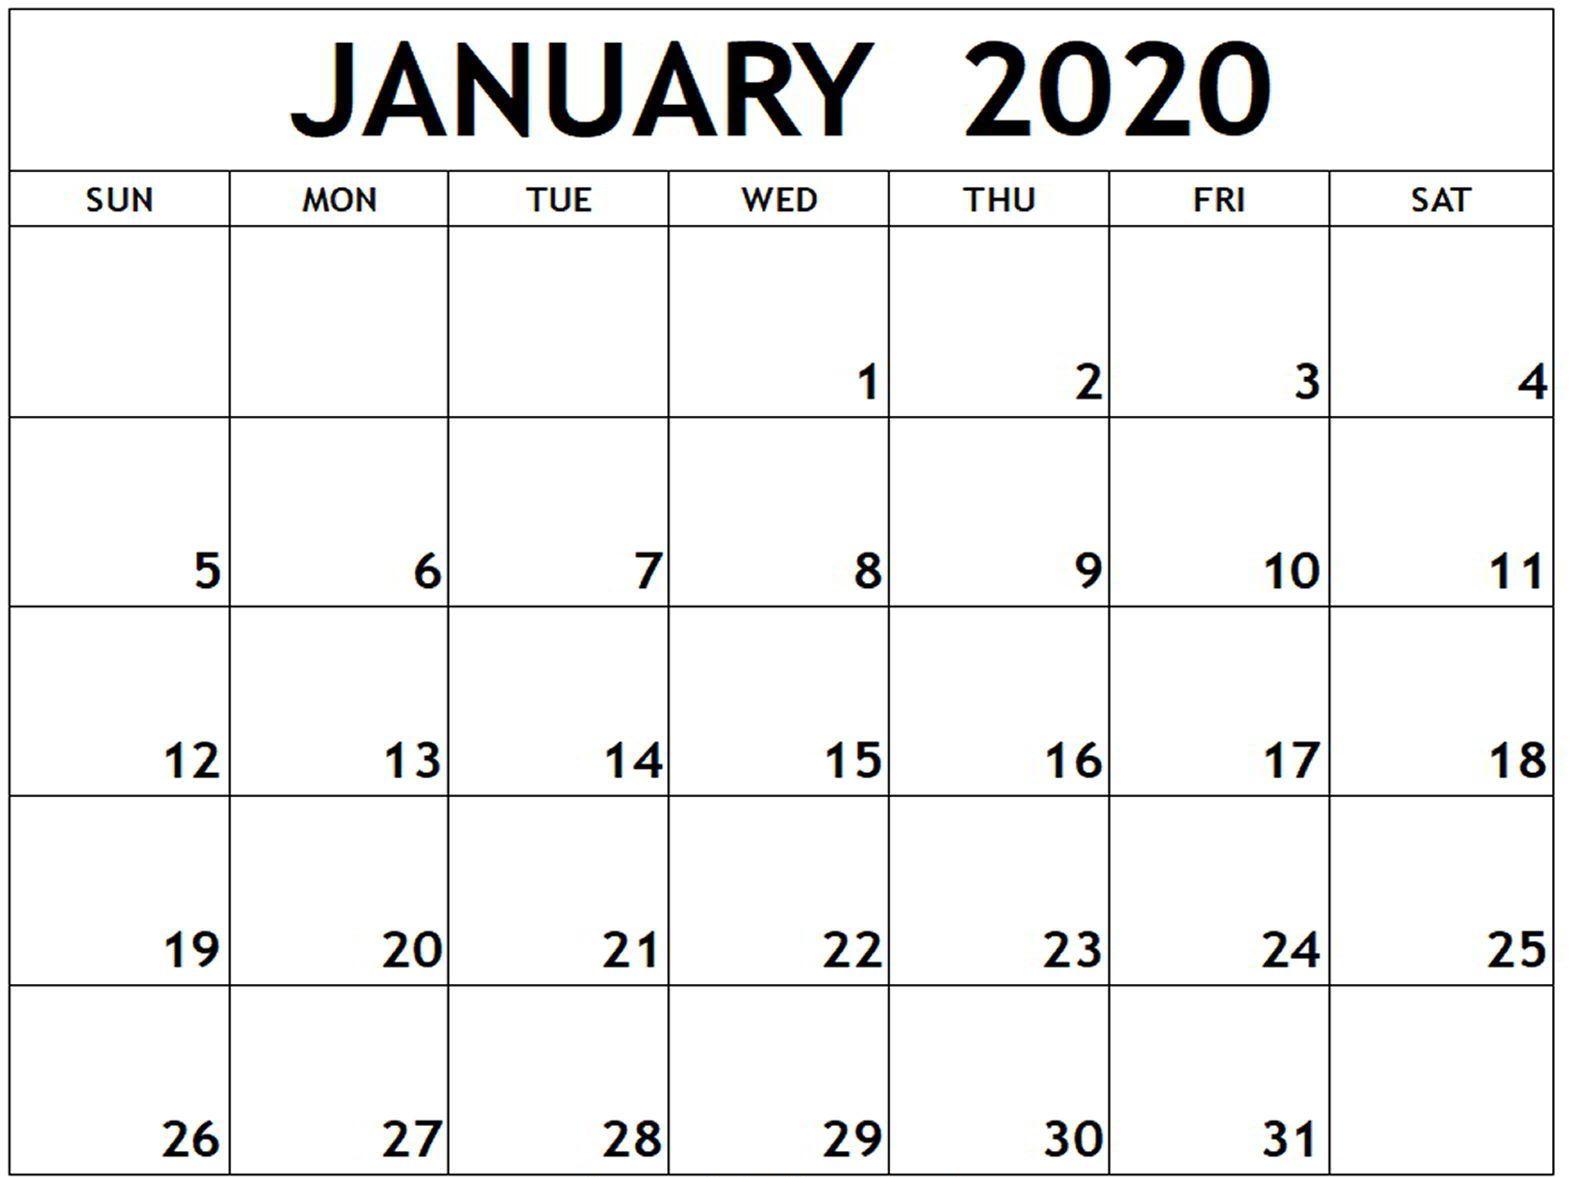 January 2020 Calendar Word Doc | Free Calendar Template for Blank January Calendar 2020